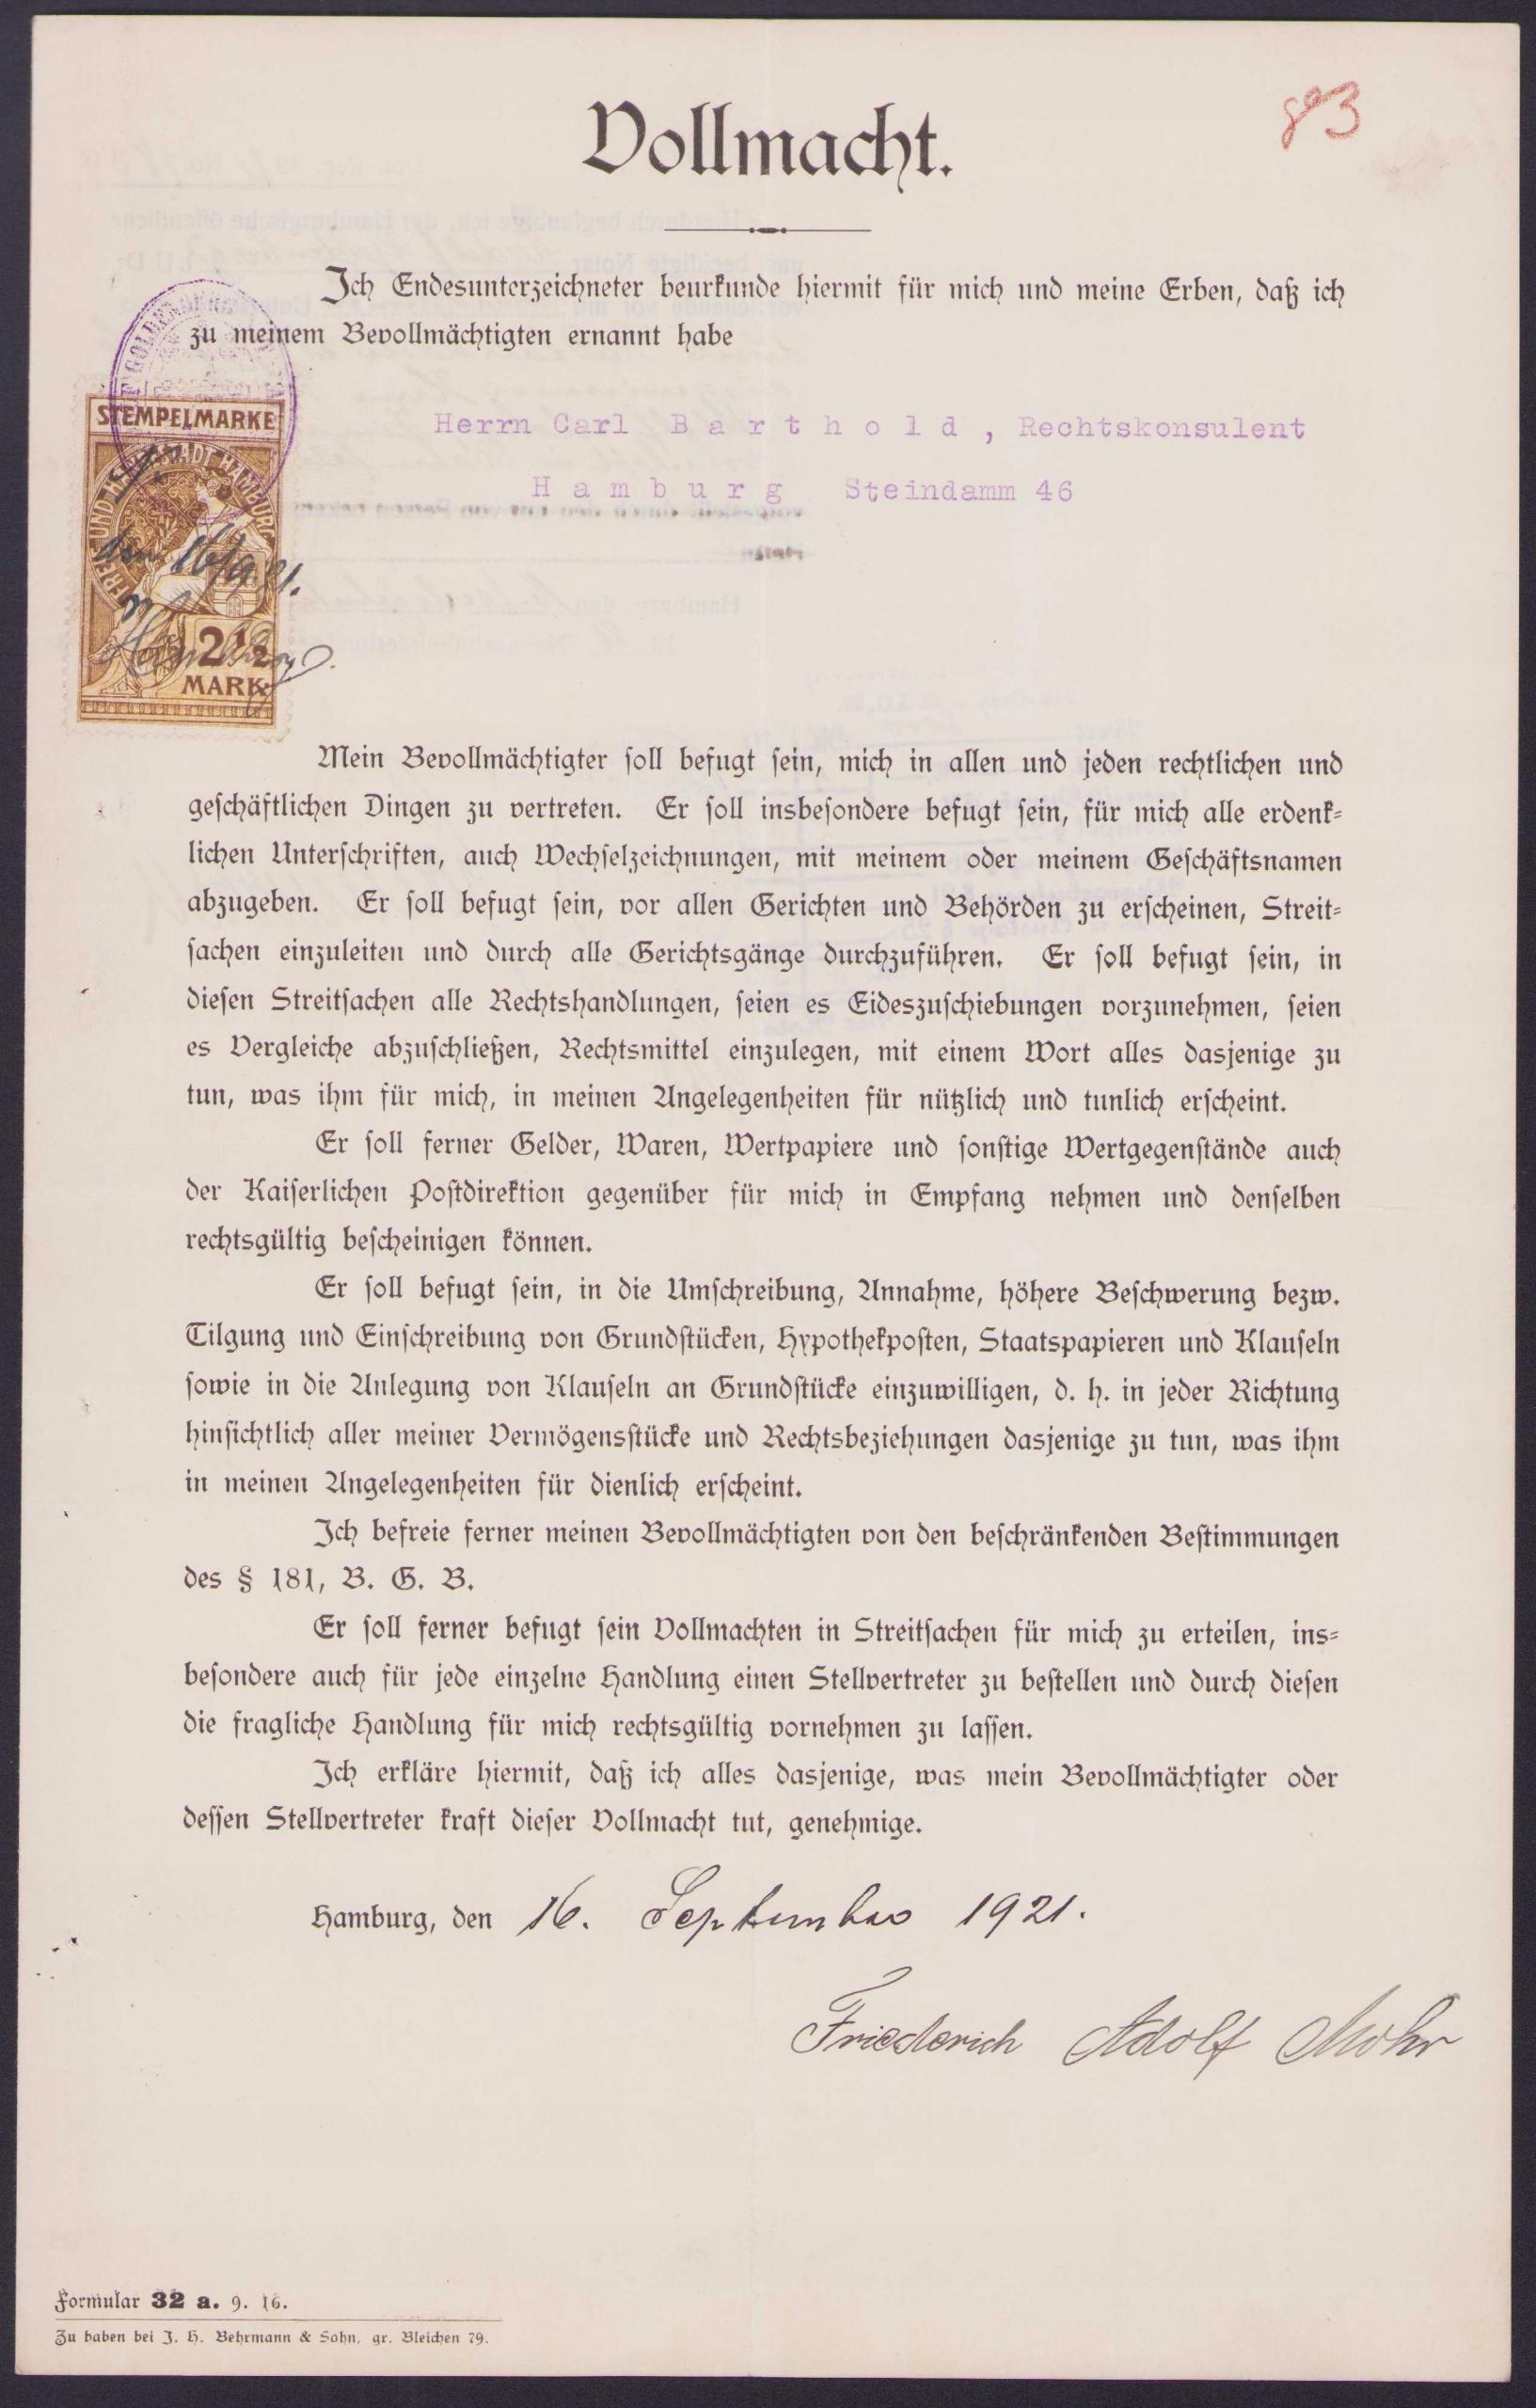 ДОХОД - Доверенность Фольмахта, Гамбург, 1921 г.